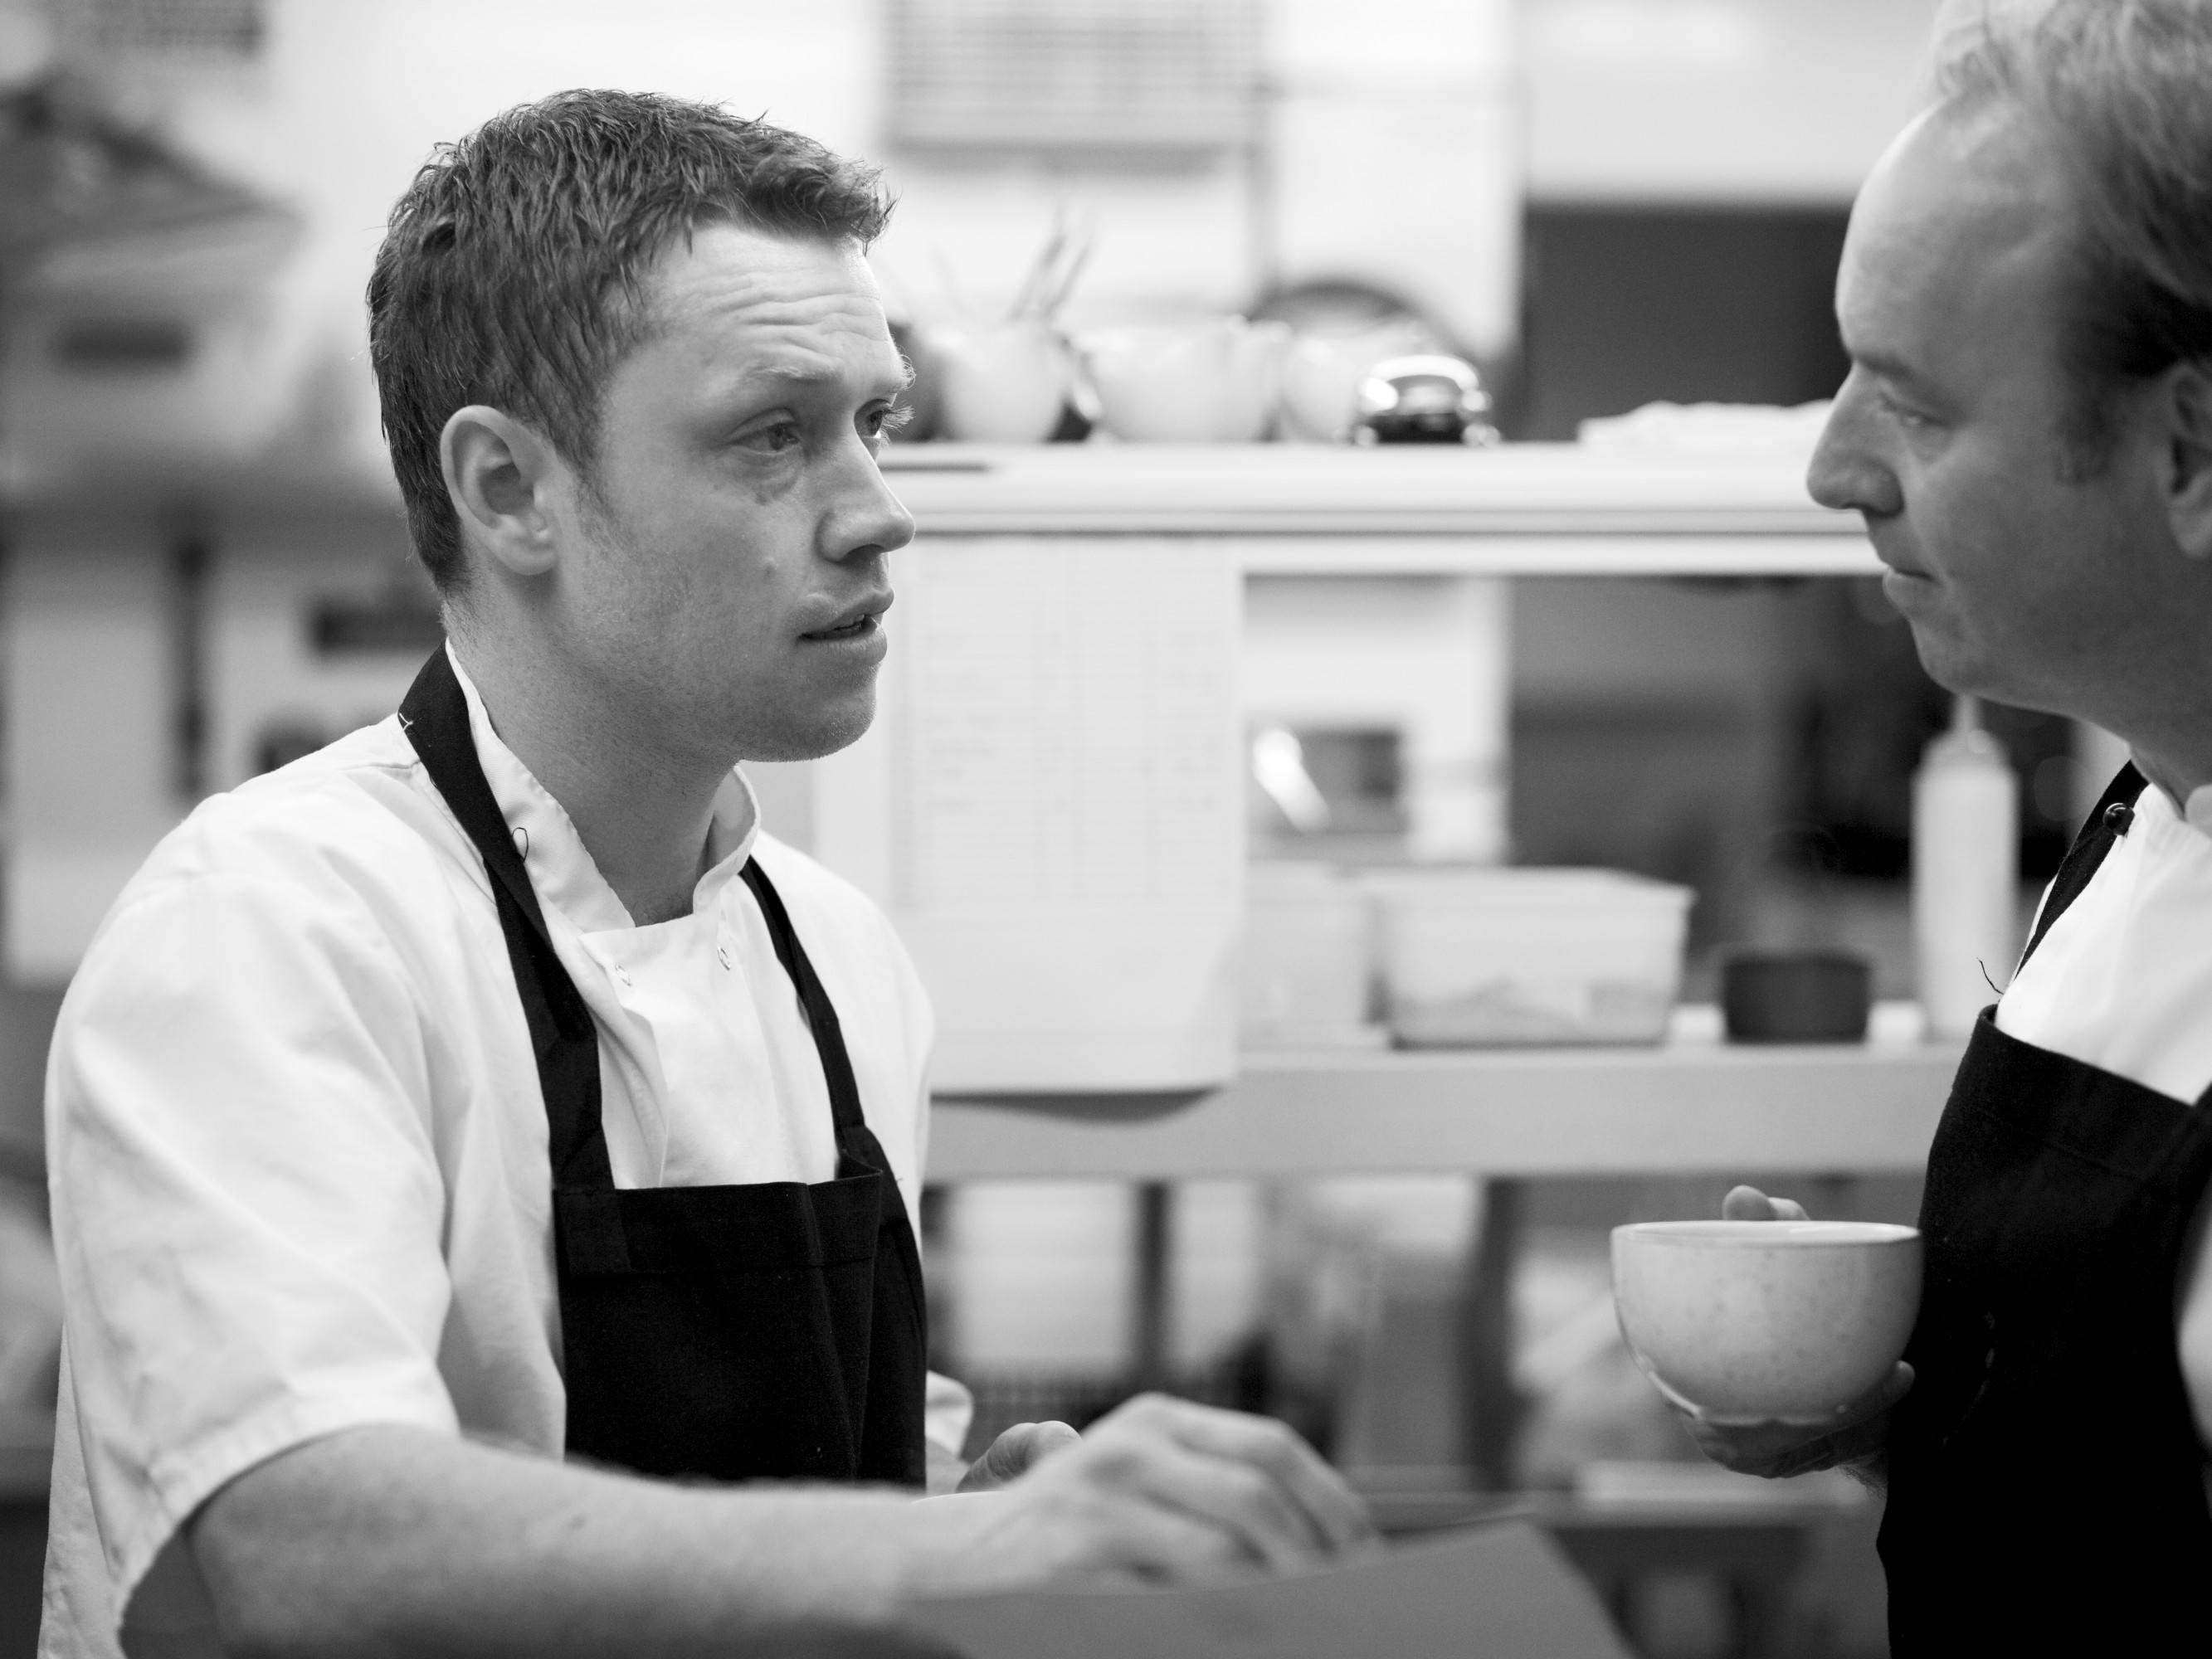 Chef Danny Durose at The Royal Oak Swallowcliffe